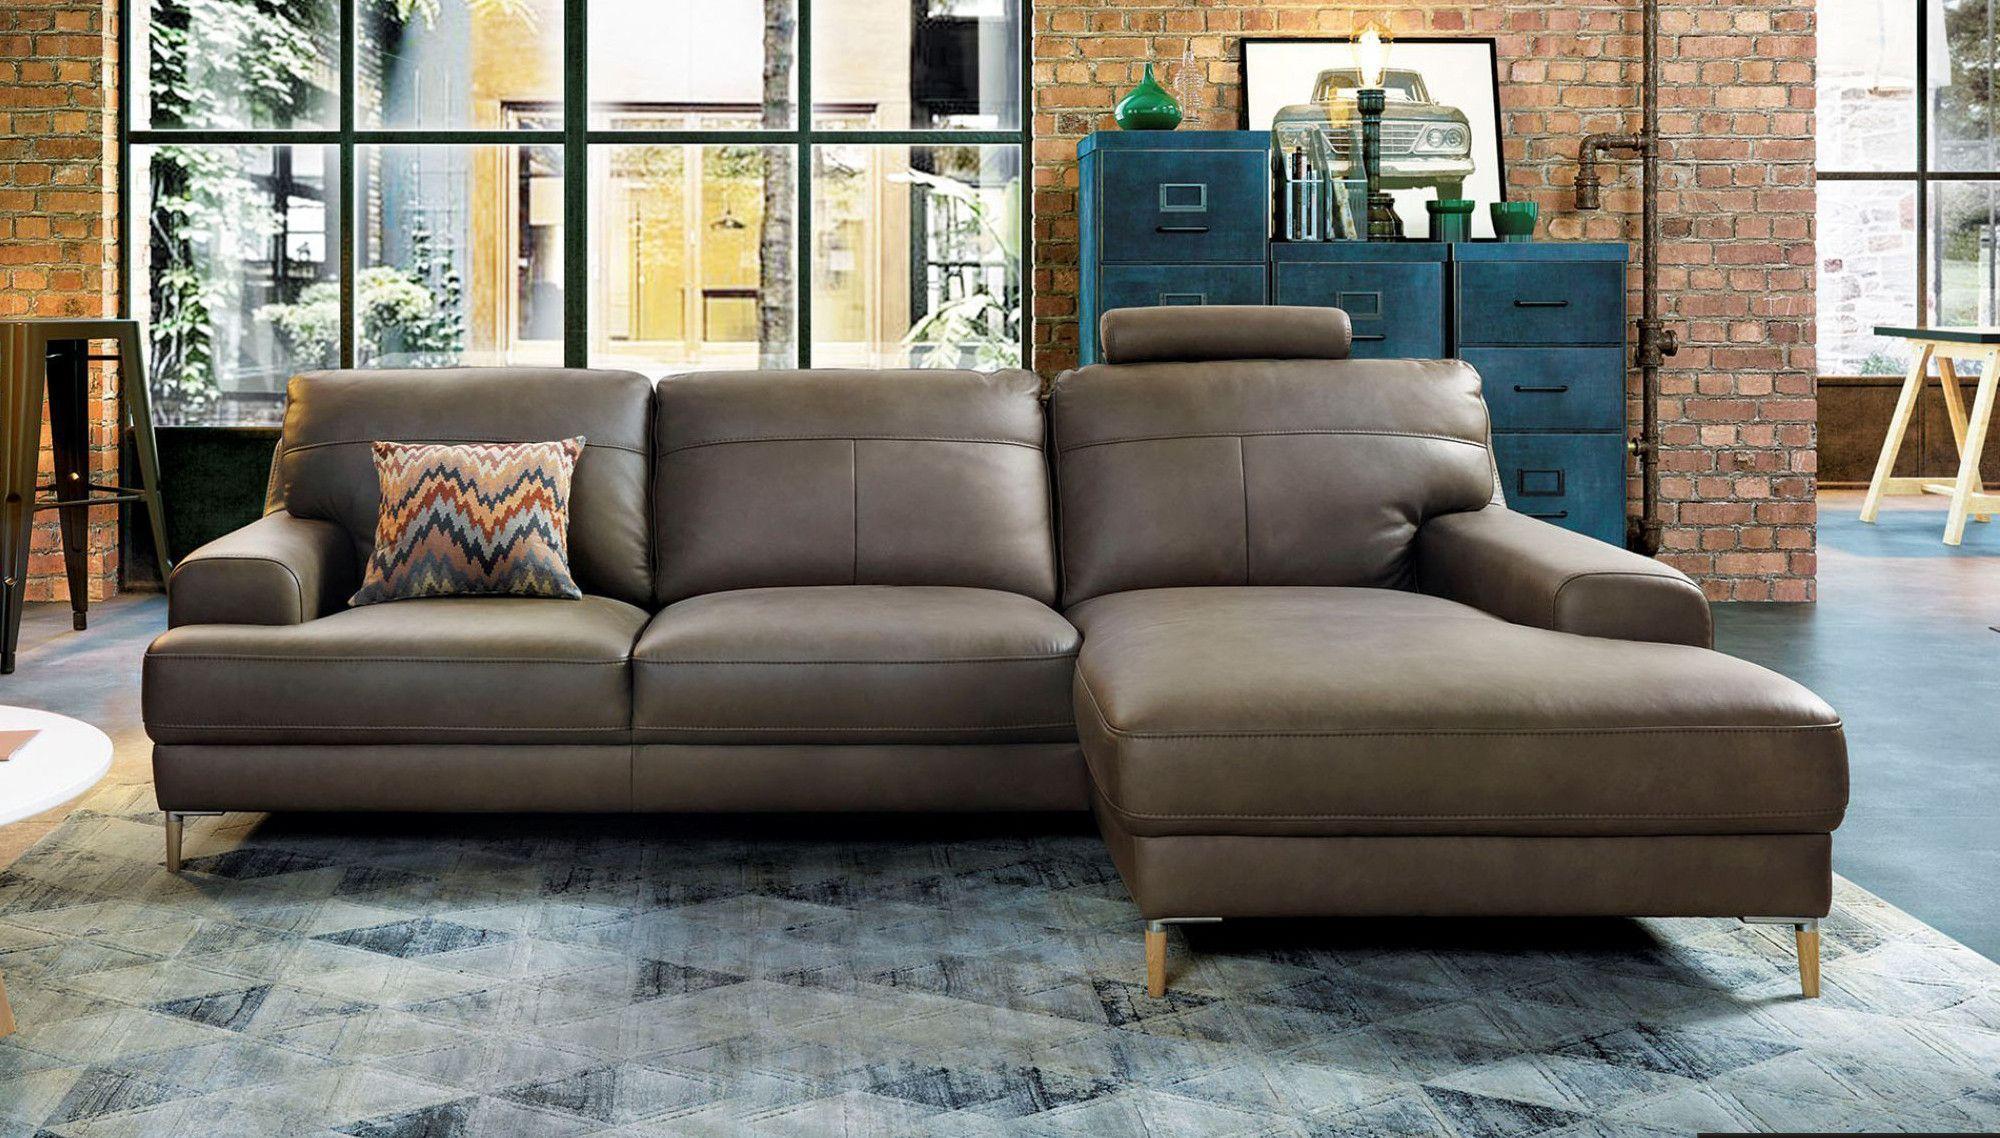 Full Size of Mondo Brick Sofa Bertinoro Leder 2 Agata Meble Couch Kaufen Softline Bed 1 Group Srl Orari Online 3 Modernes Eck Ledersofa Poco Big Sitzsack 2er Rattan Sofa Mondo Sofa